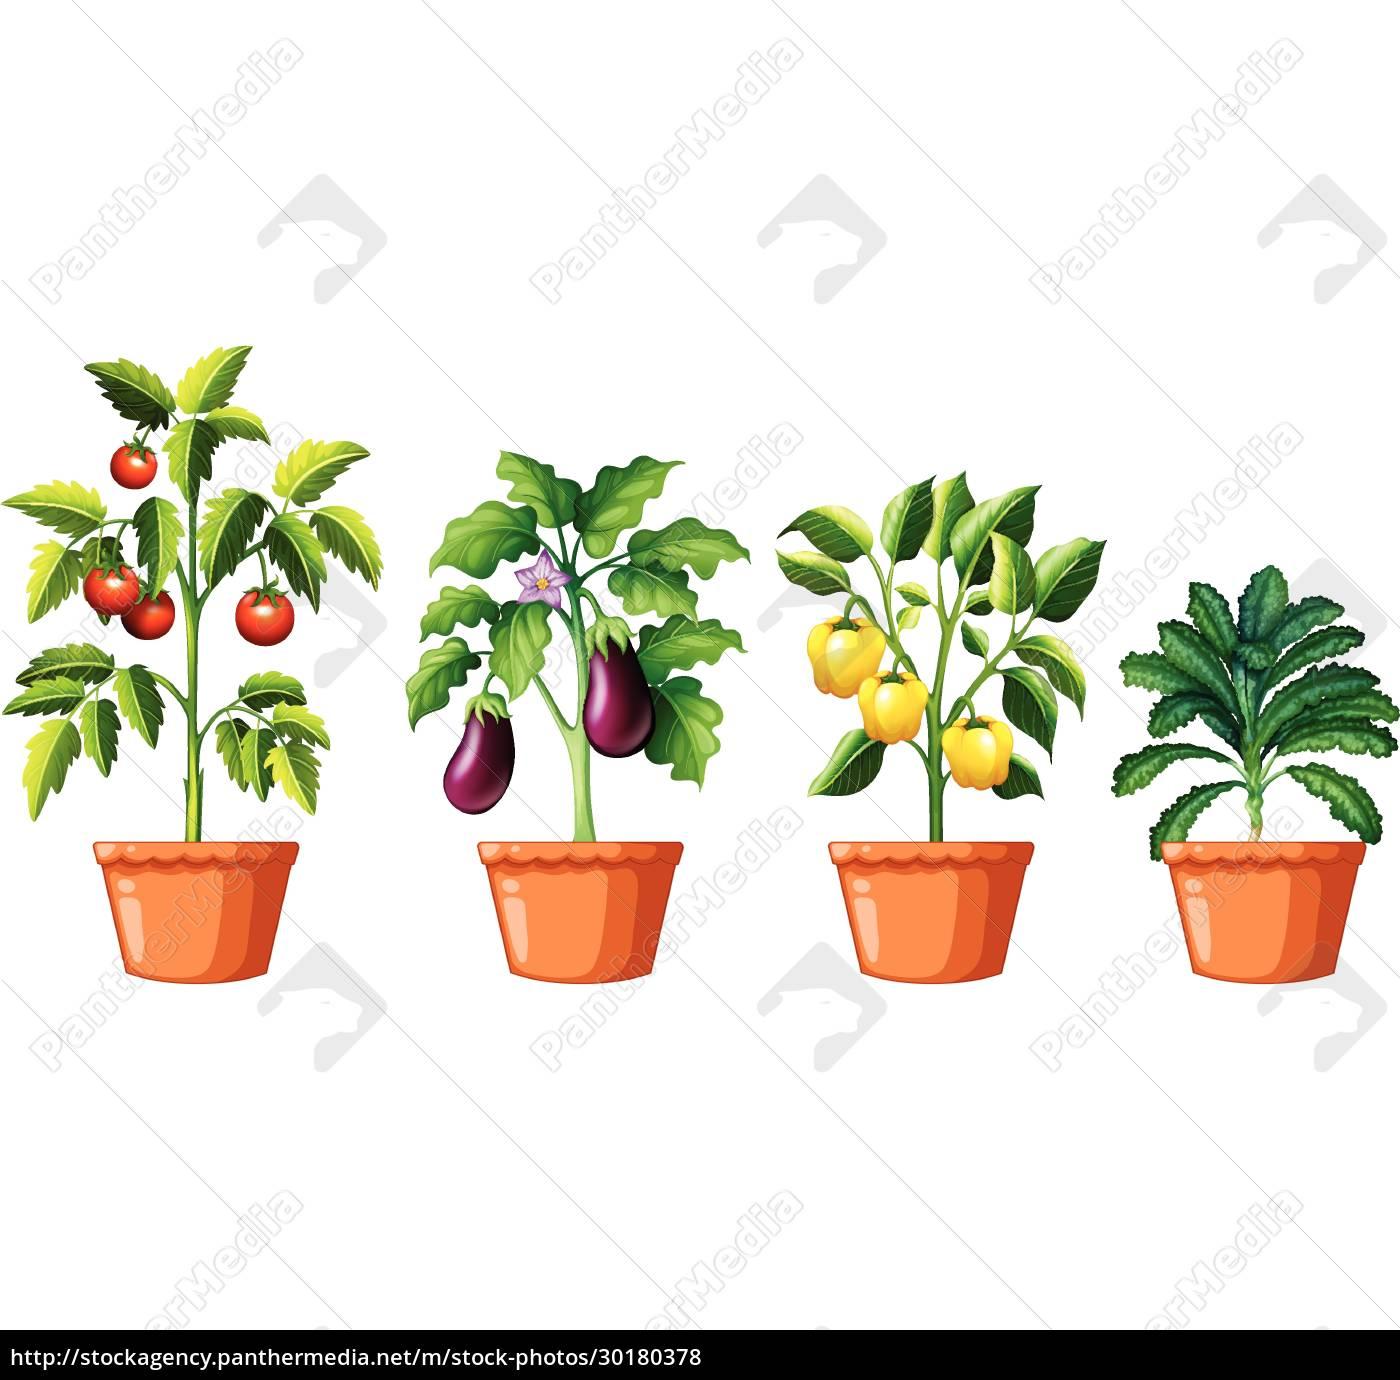 set, of, different, plants - 30180378